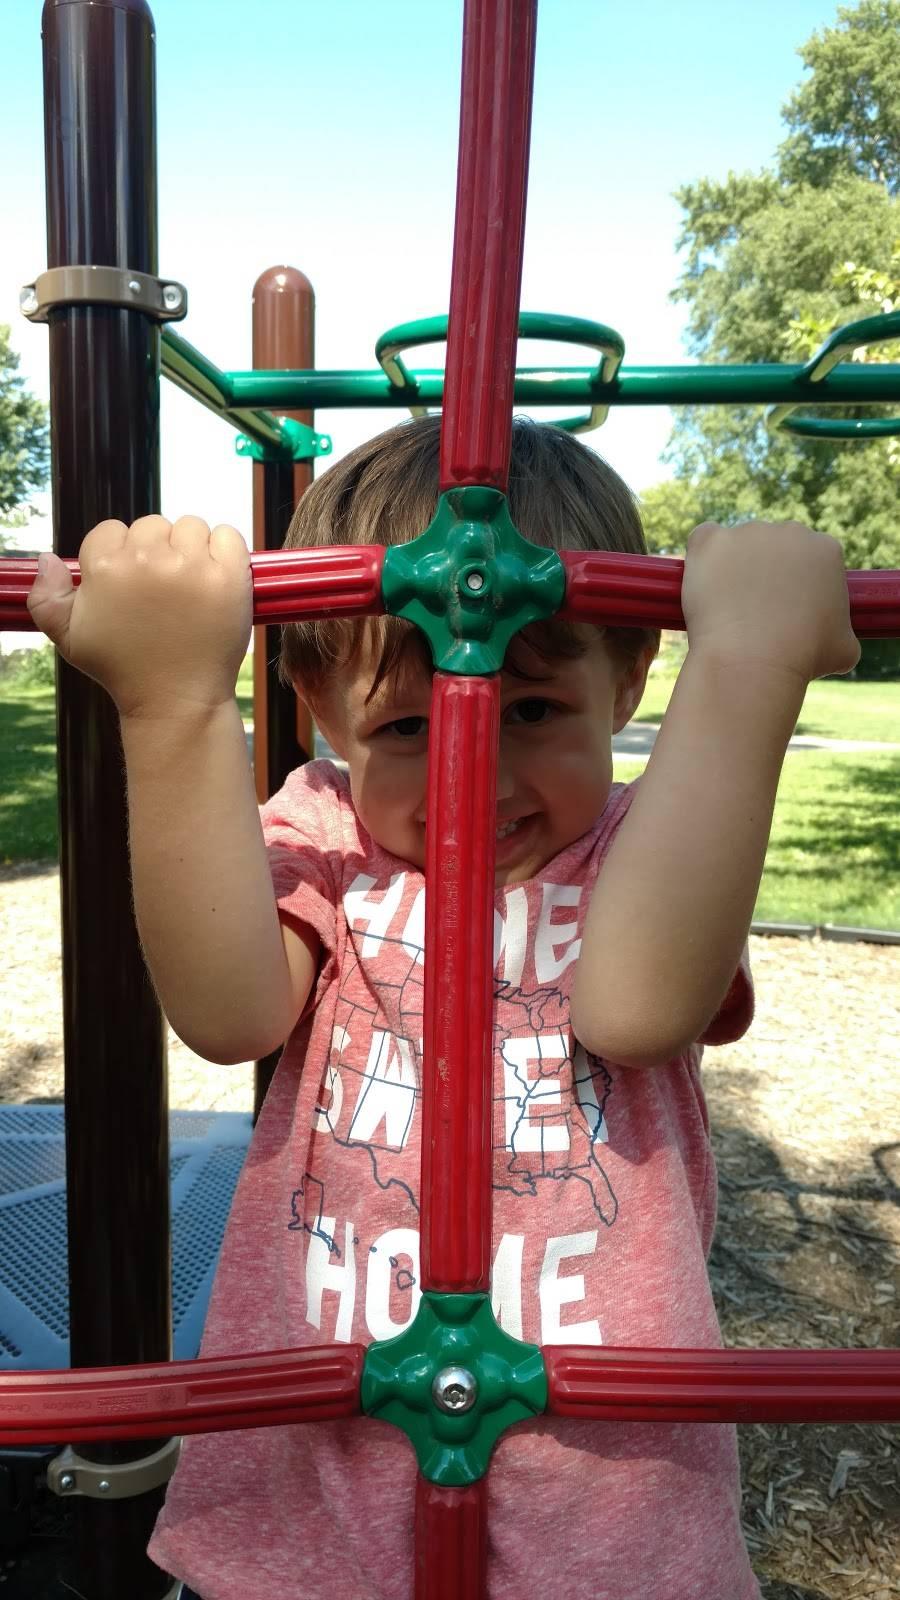 Midland Park - park  | Photo 5 of 9 | Address: Midland Park, 1005 Midland St, Madison, WI 53715, USA | Phone: (608) 266-4711